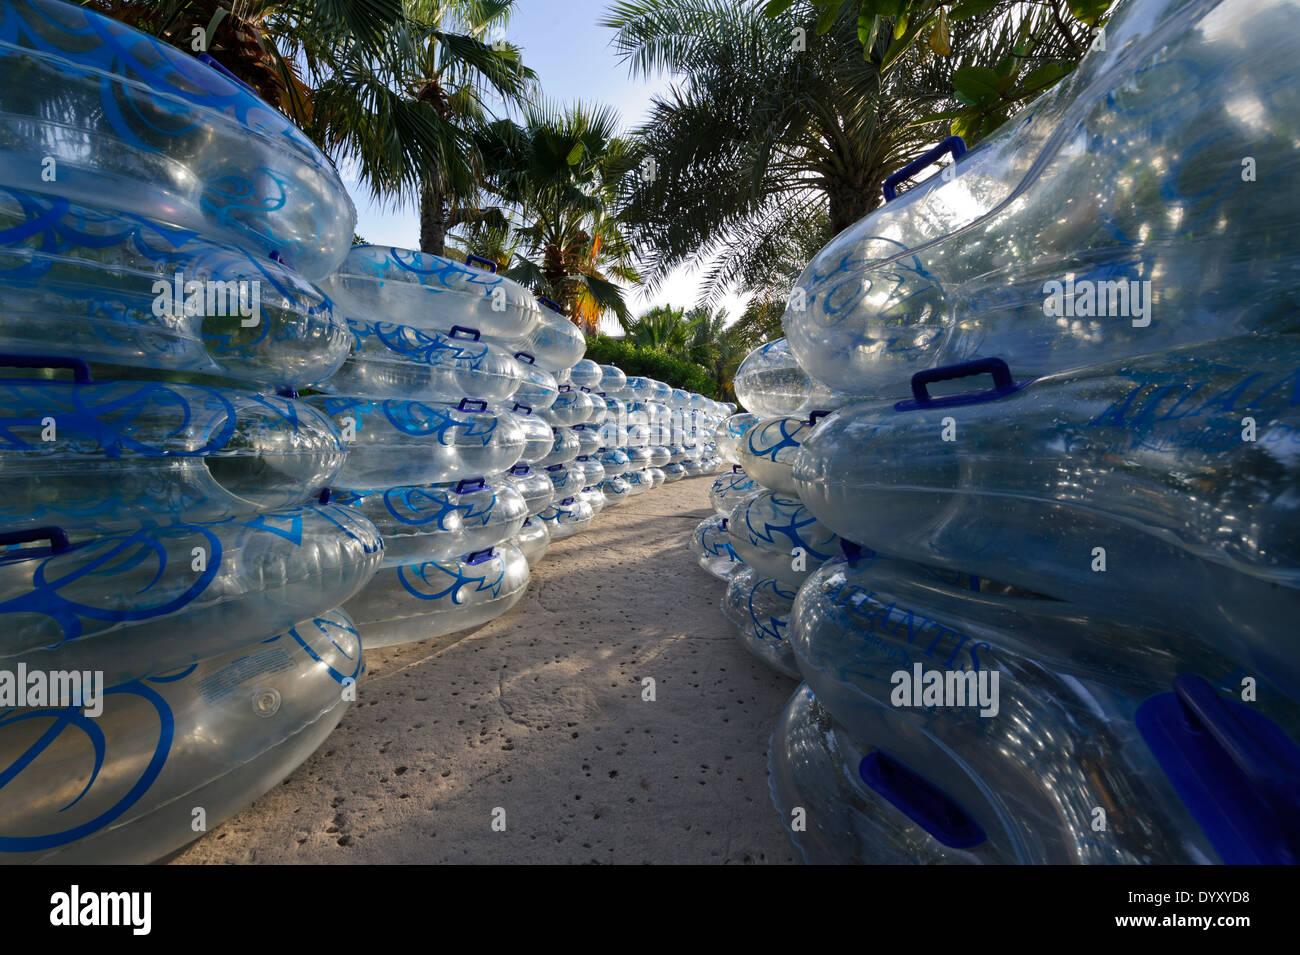 Plastic floaters used by tourists at the Atlantis, The Palm Hotel, Dubai, United Arab Emirates, UAE. - Stock Image